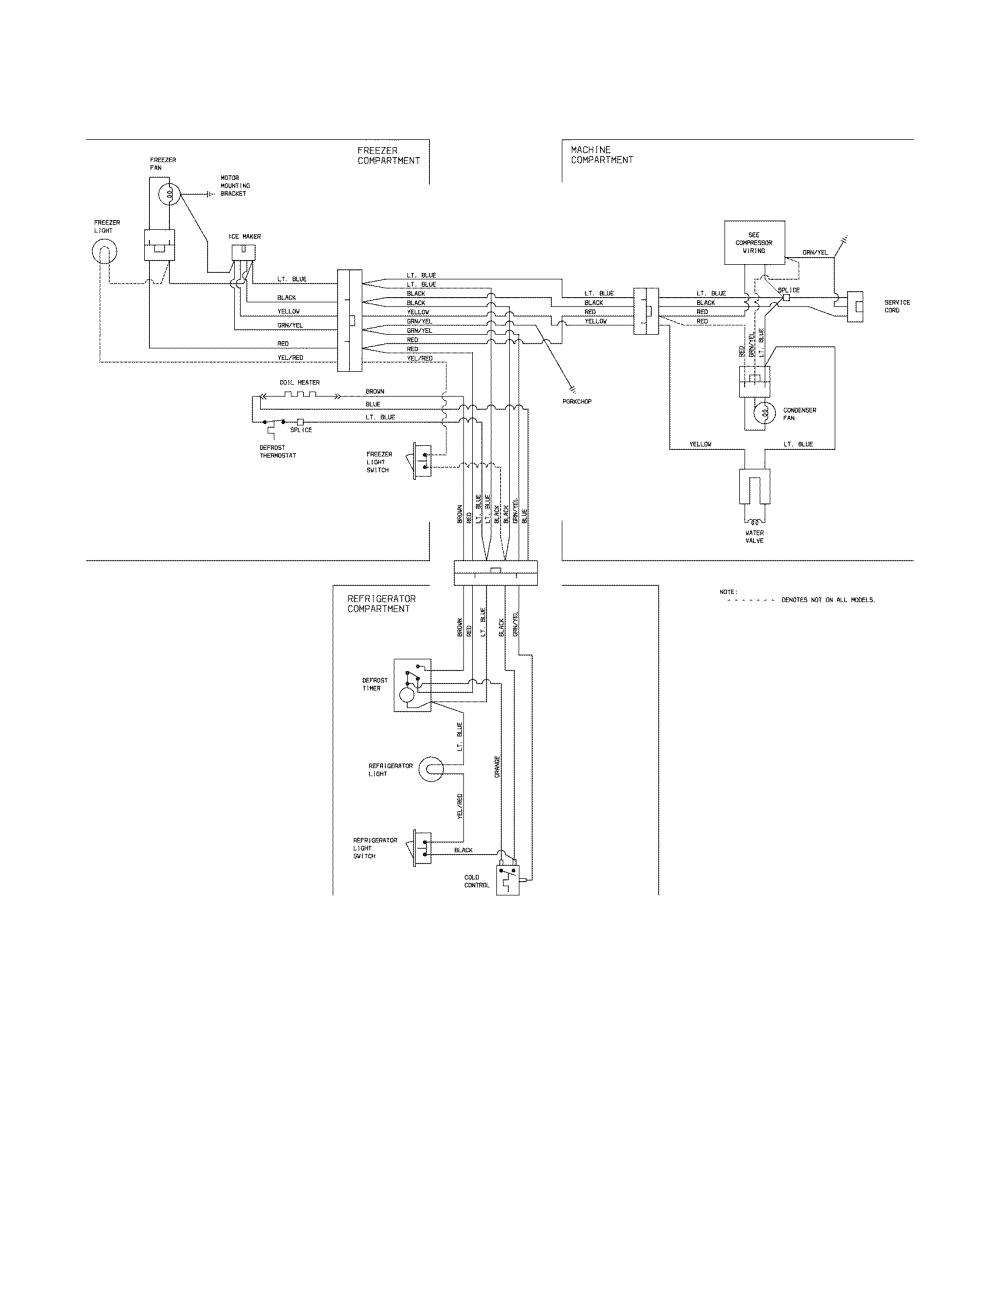 medium resolution of sears refrigerator wiring diagram wiring diagram blogs sears appliance sale kenmore model 25364522404 top mount refrigerator